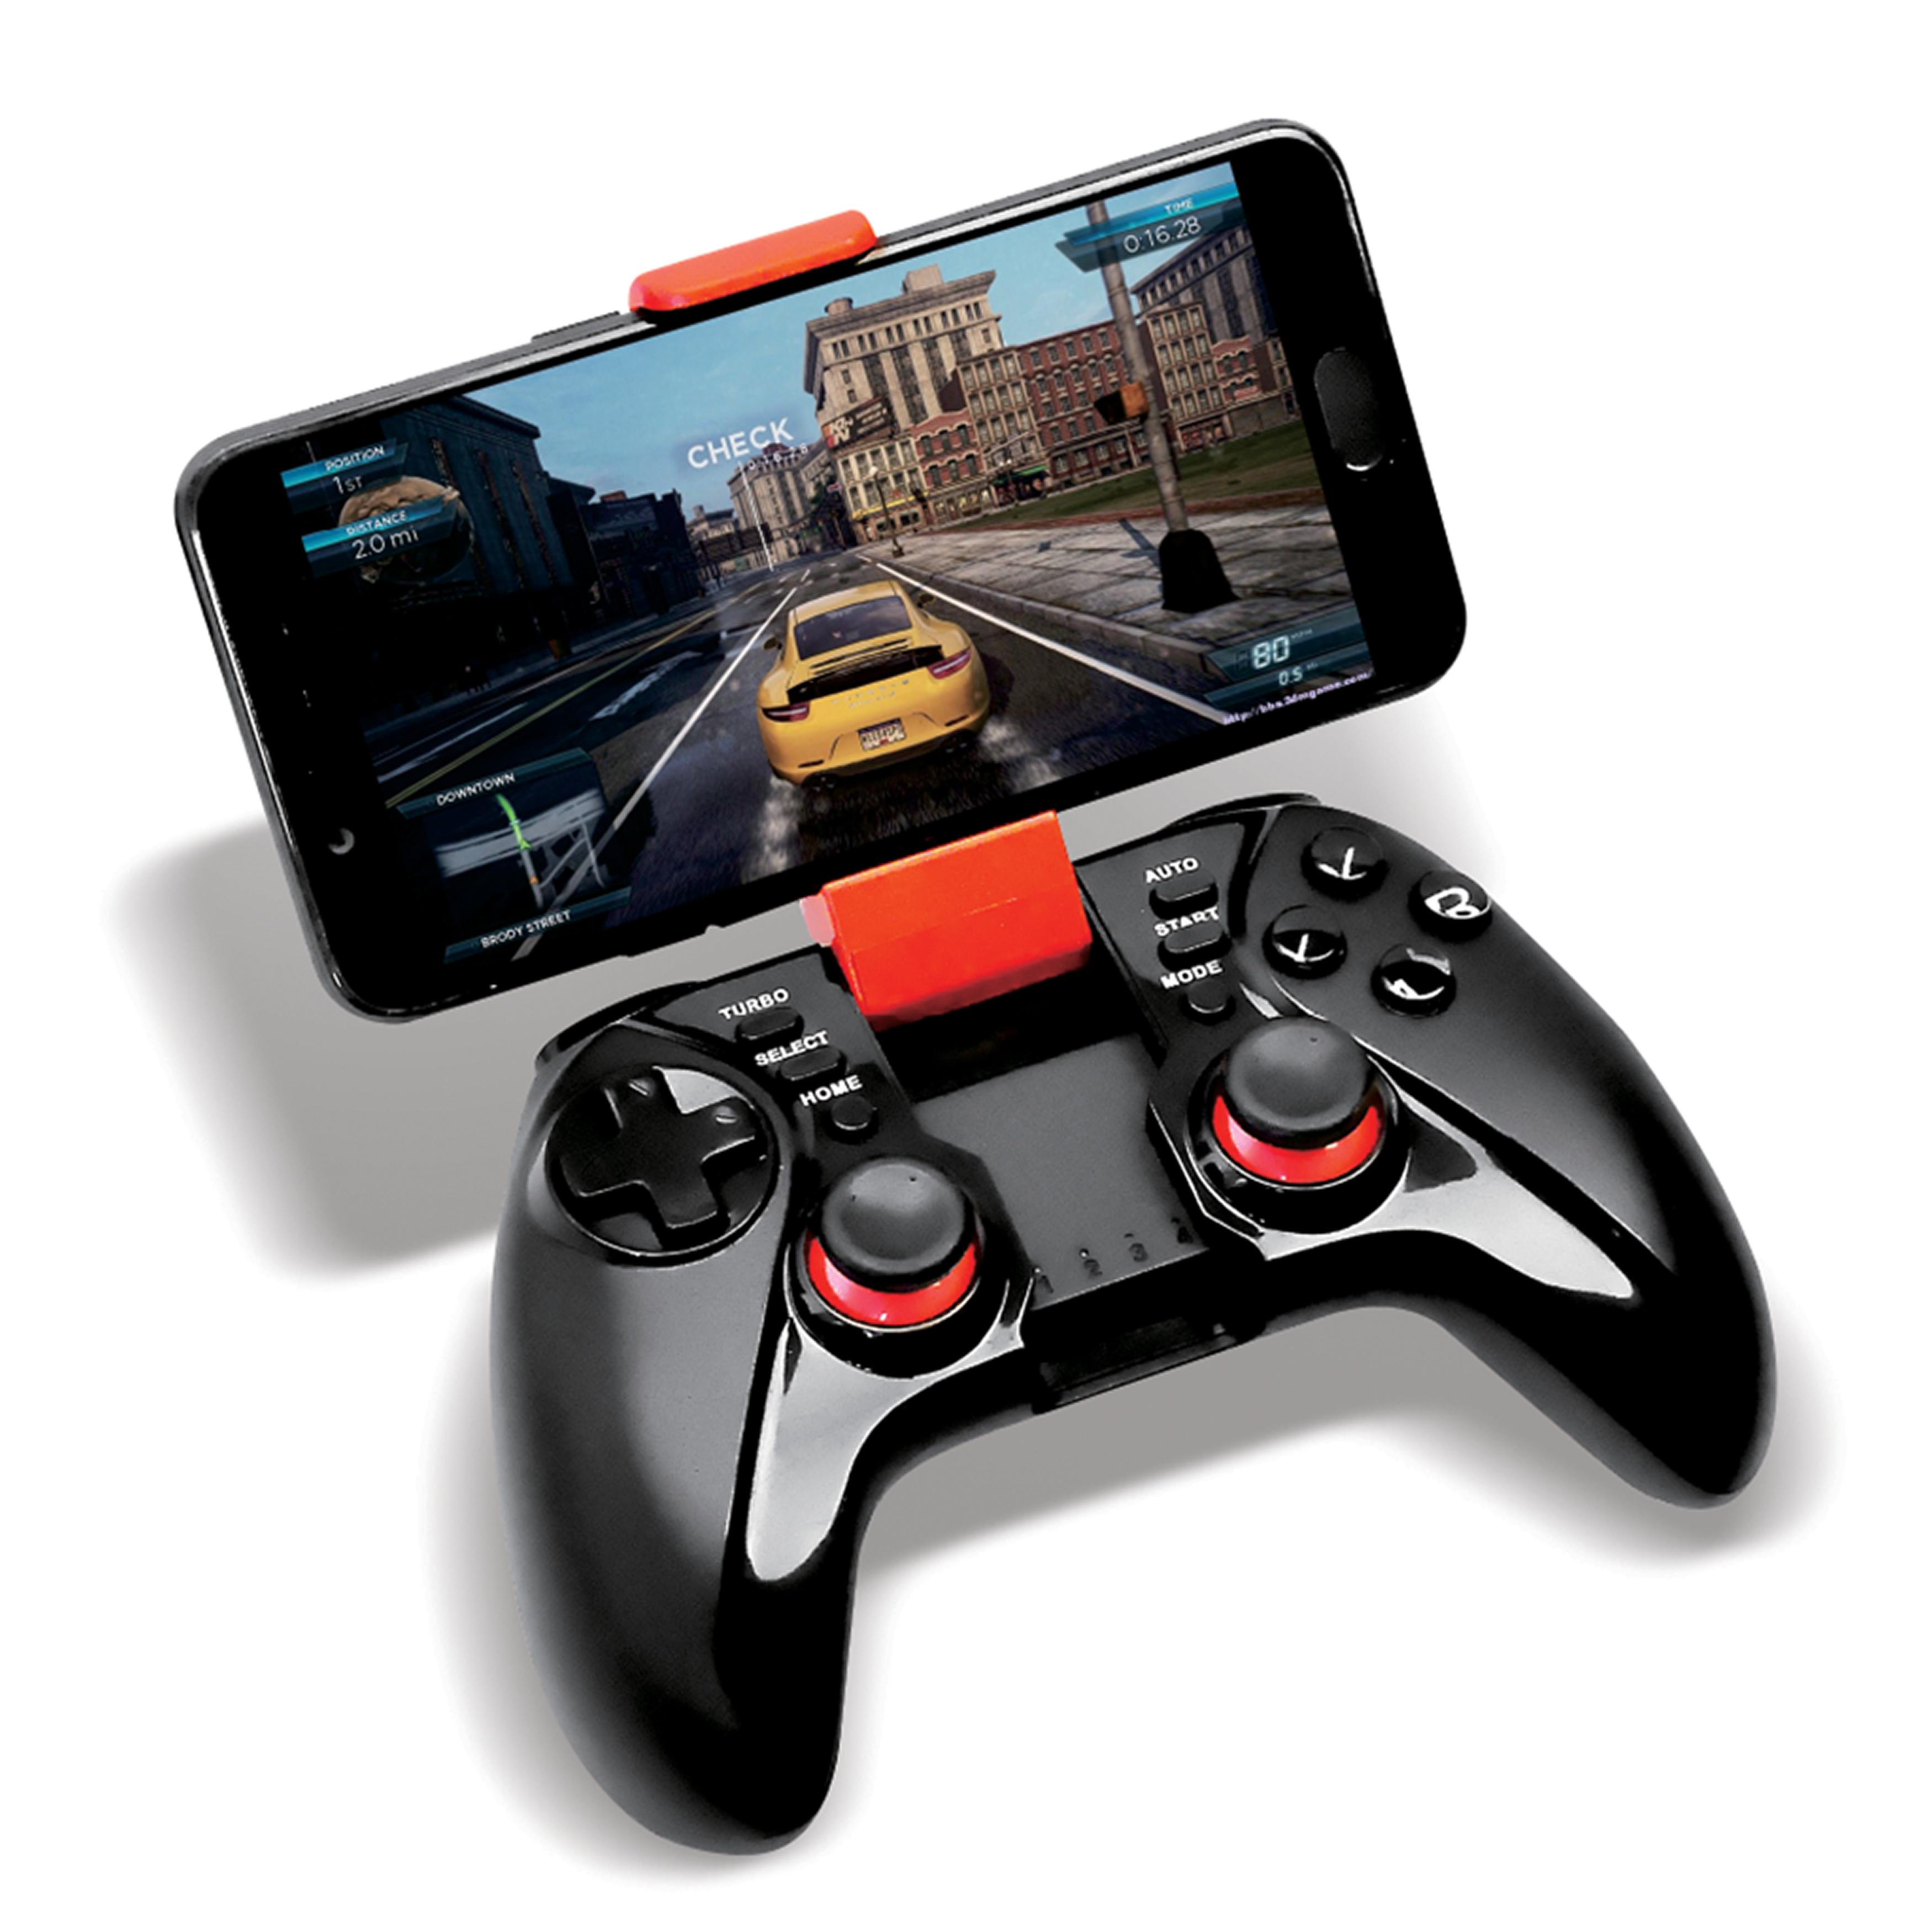 Vibra con tus videojuegos al máximo gracias al control Gamer de TechZone